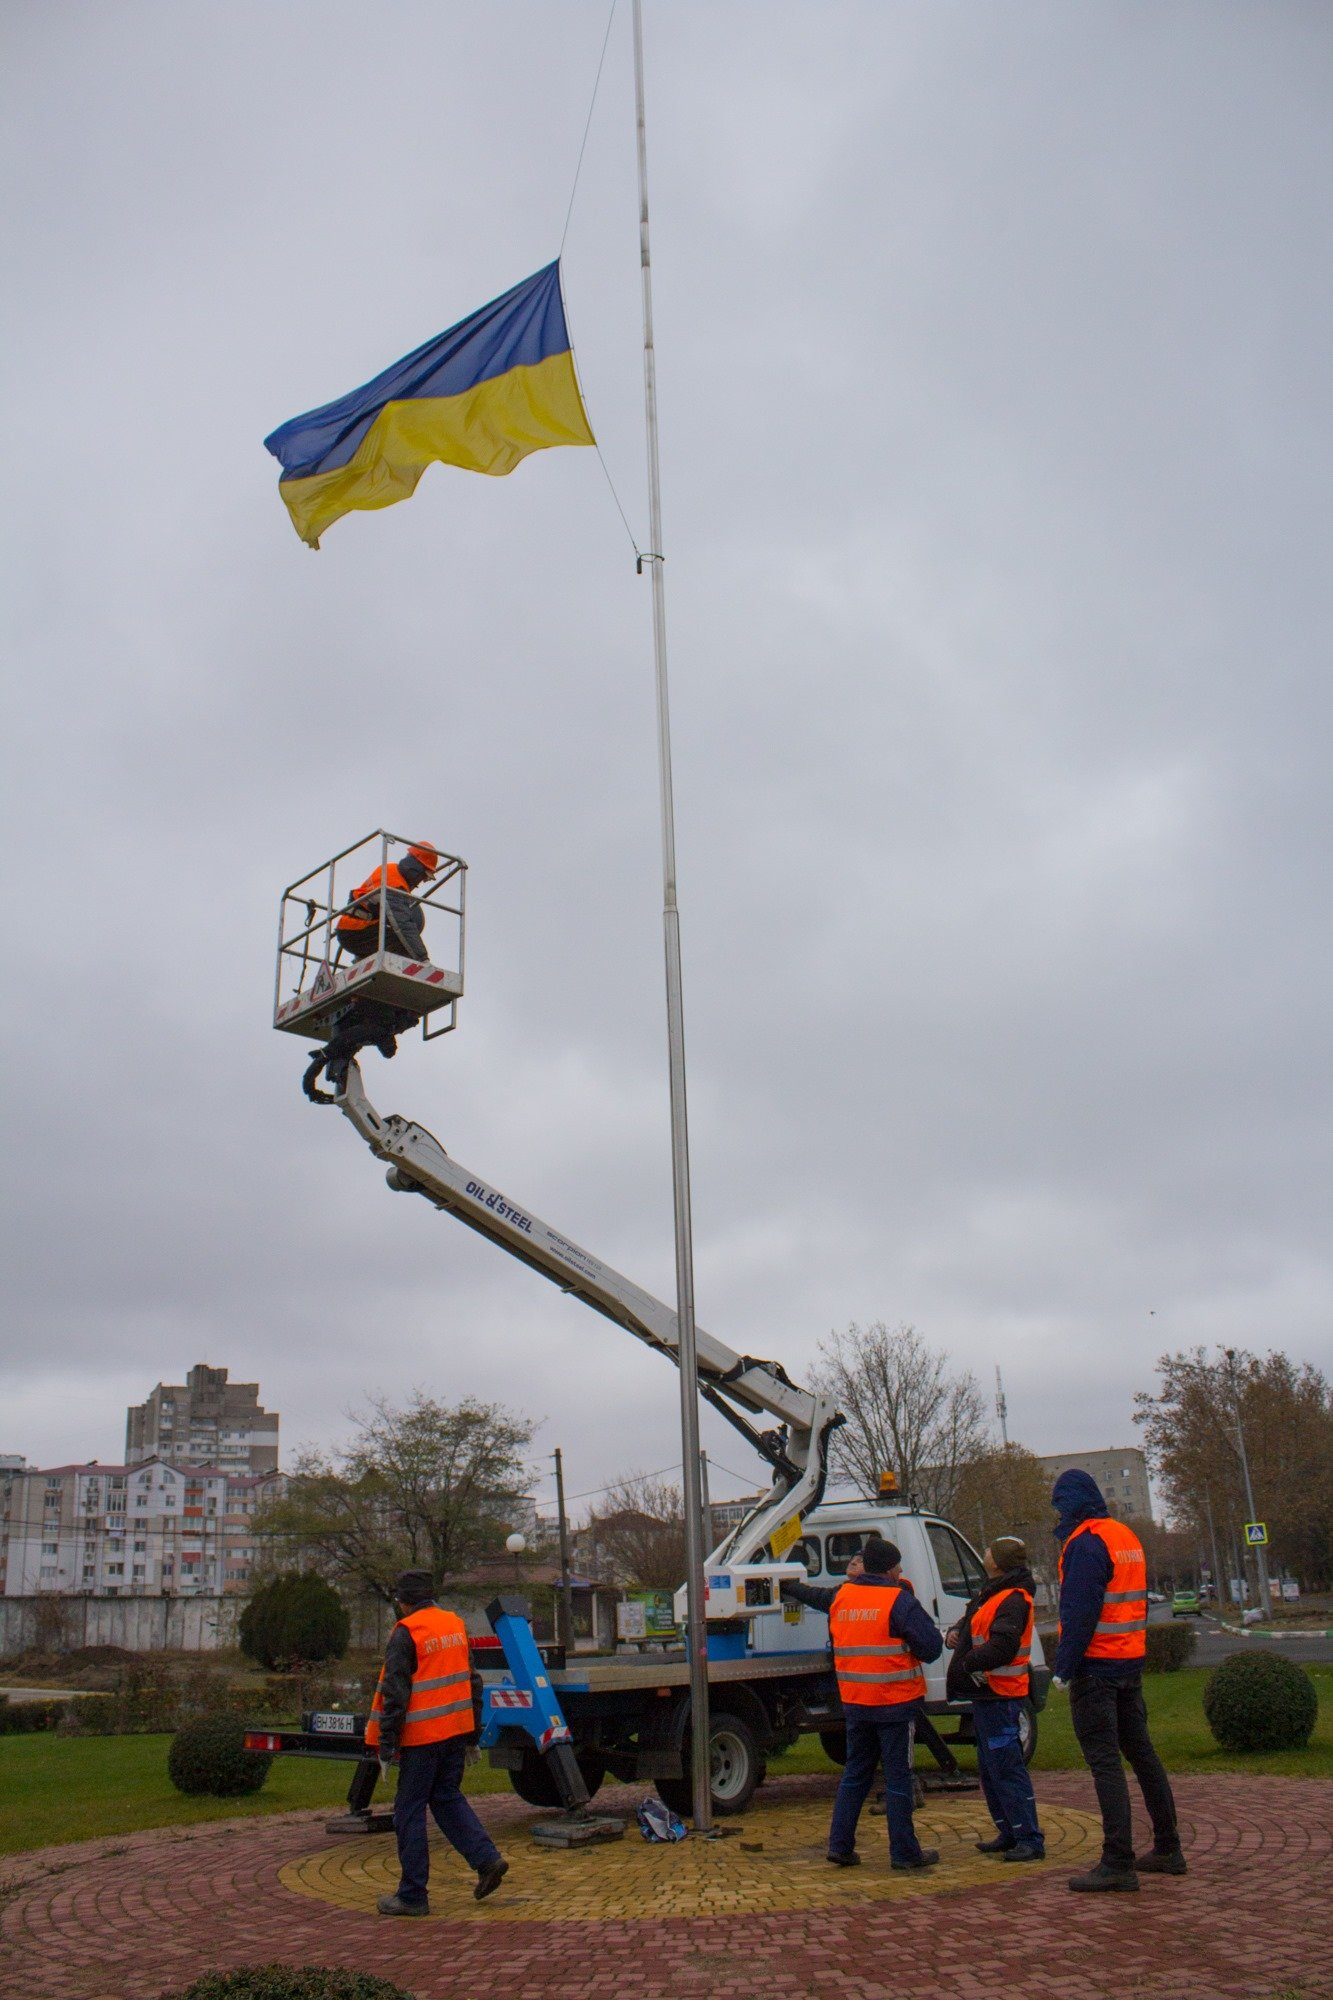 Повреждён флагшток в Черноморске: отремонтируют и снова установят, фото-1